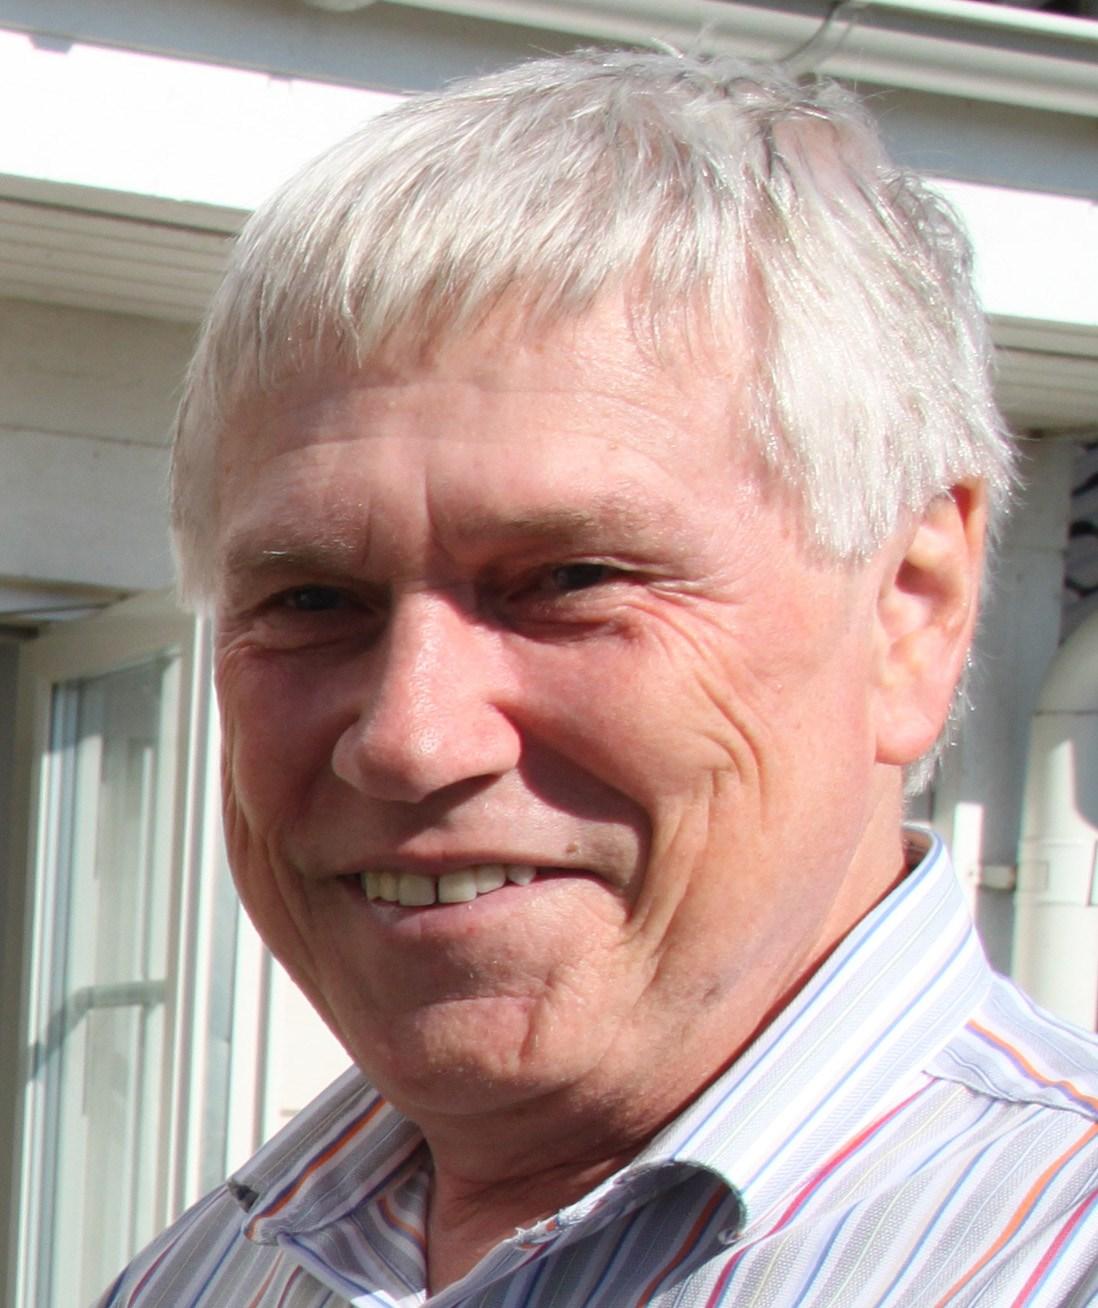 Rasmus Trads